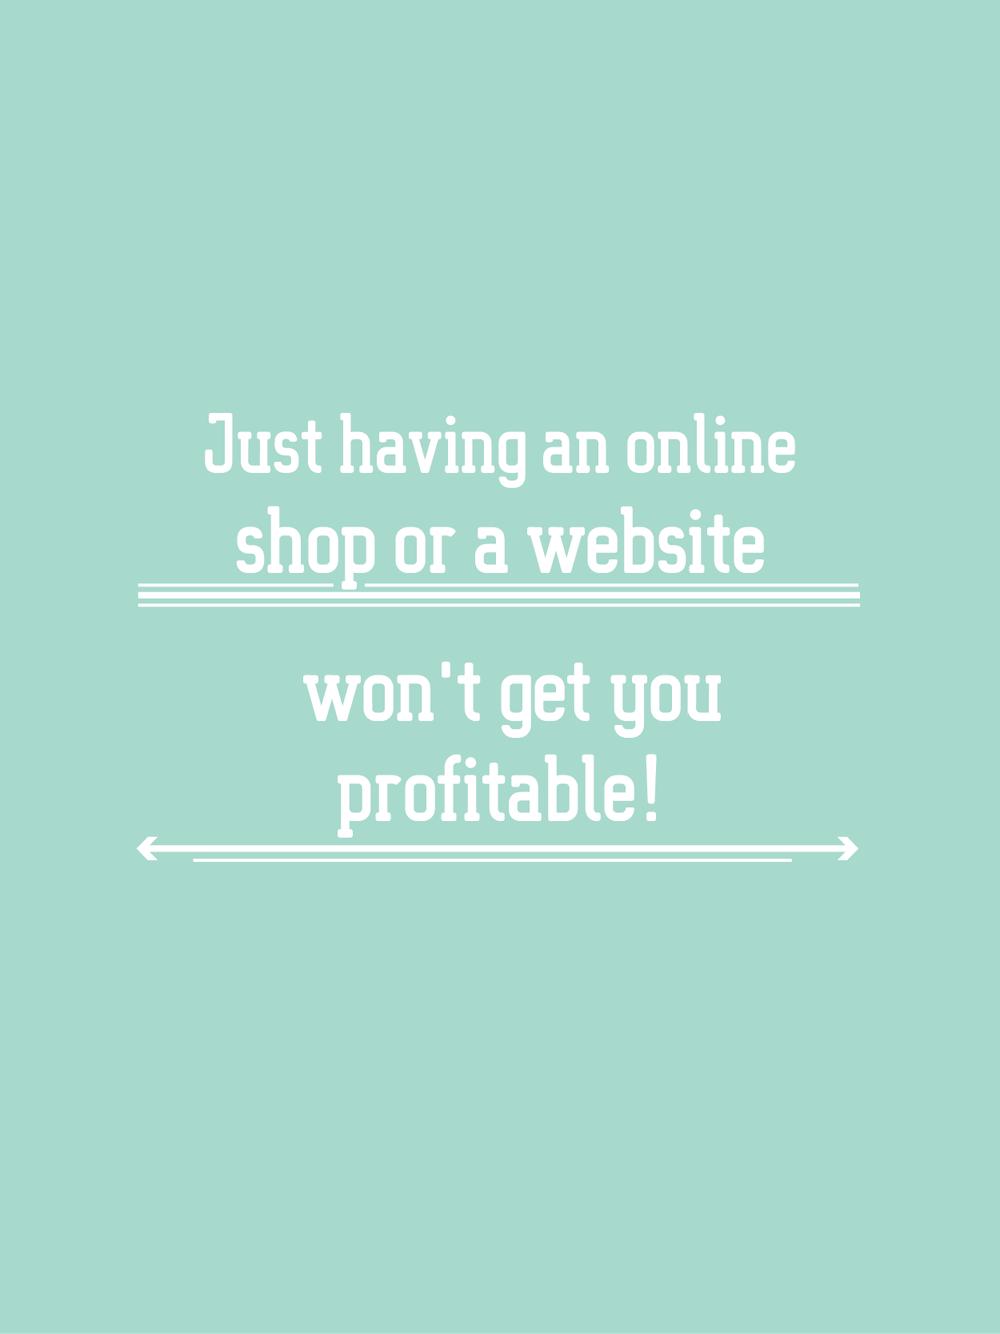 the BIZ school for creatives, Having an online shop or a website won't make you profitable, read the full blog post at www.kerstinpressler.com/blog